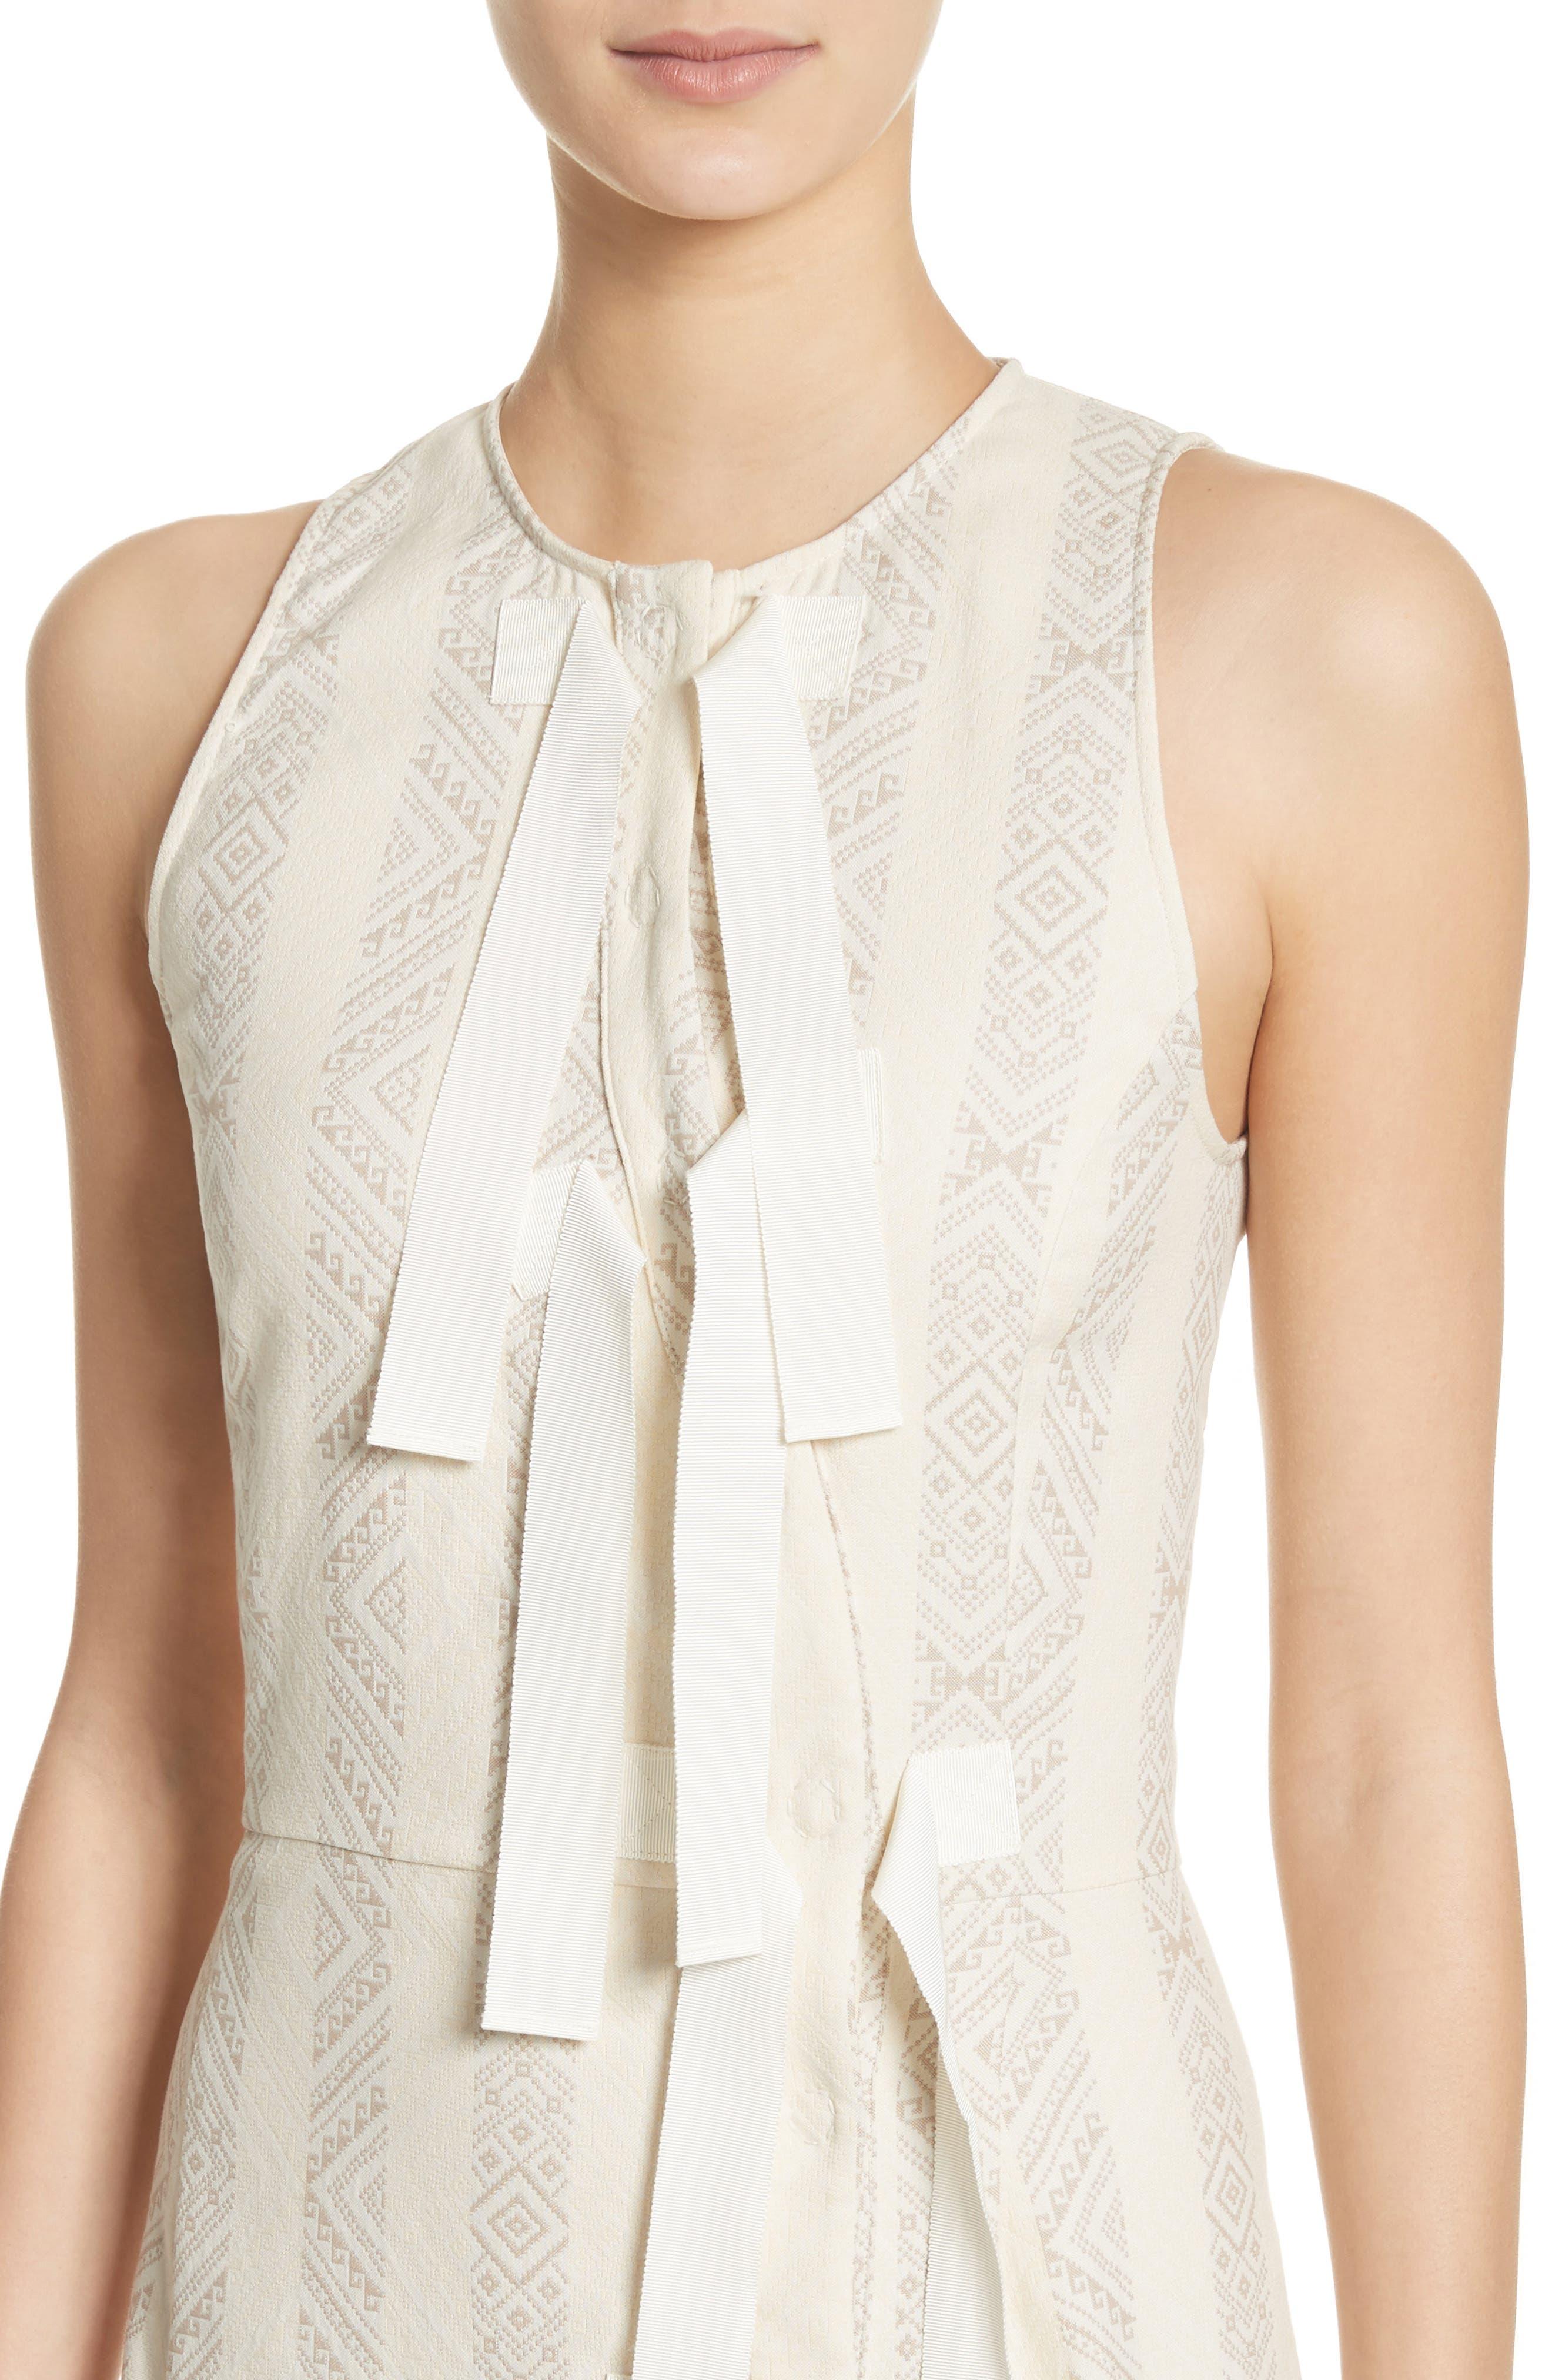 Grosgrain Tie Stripe Dress,                             Alternate thumbnail 4, color,                             106